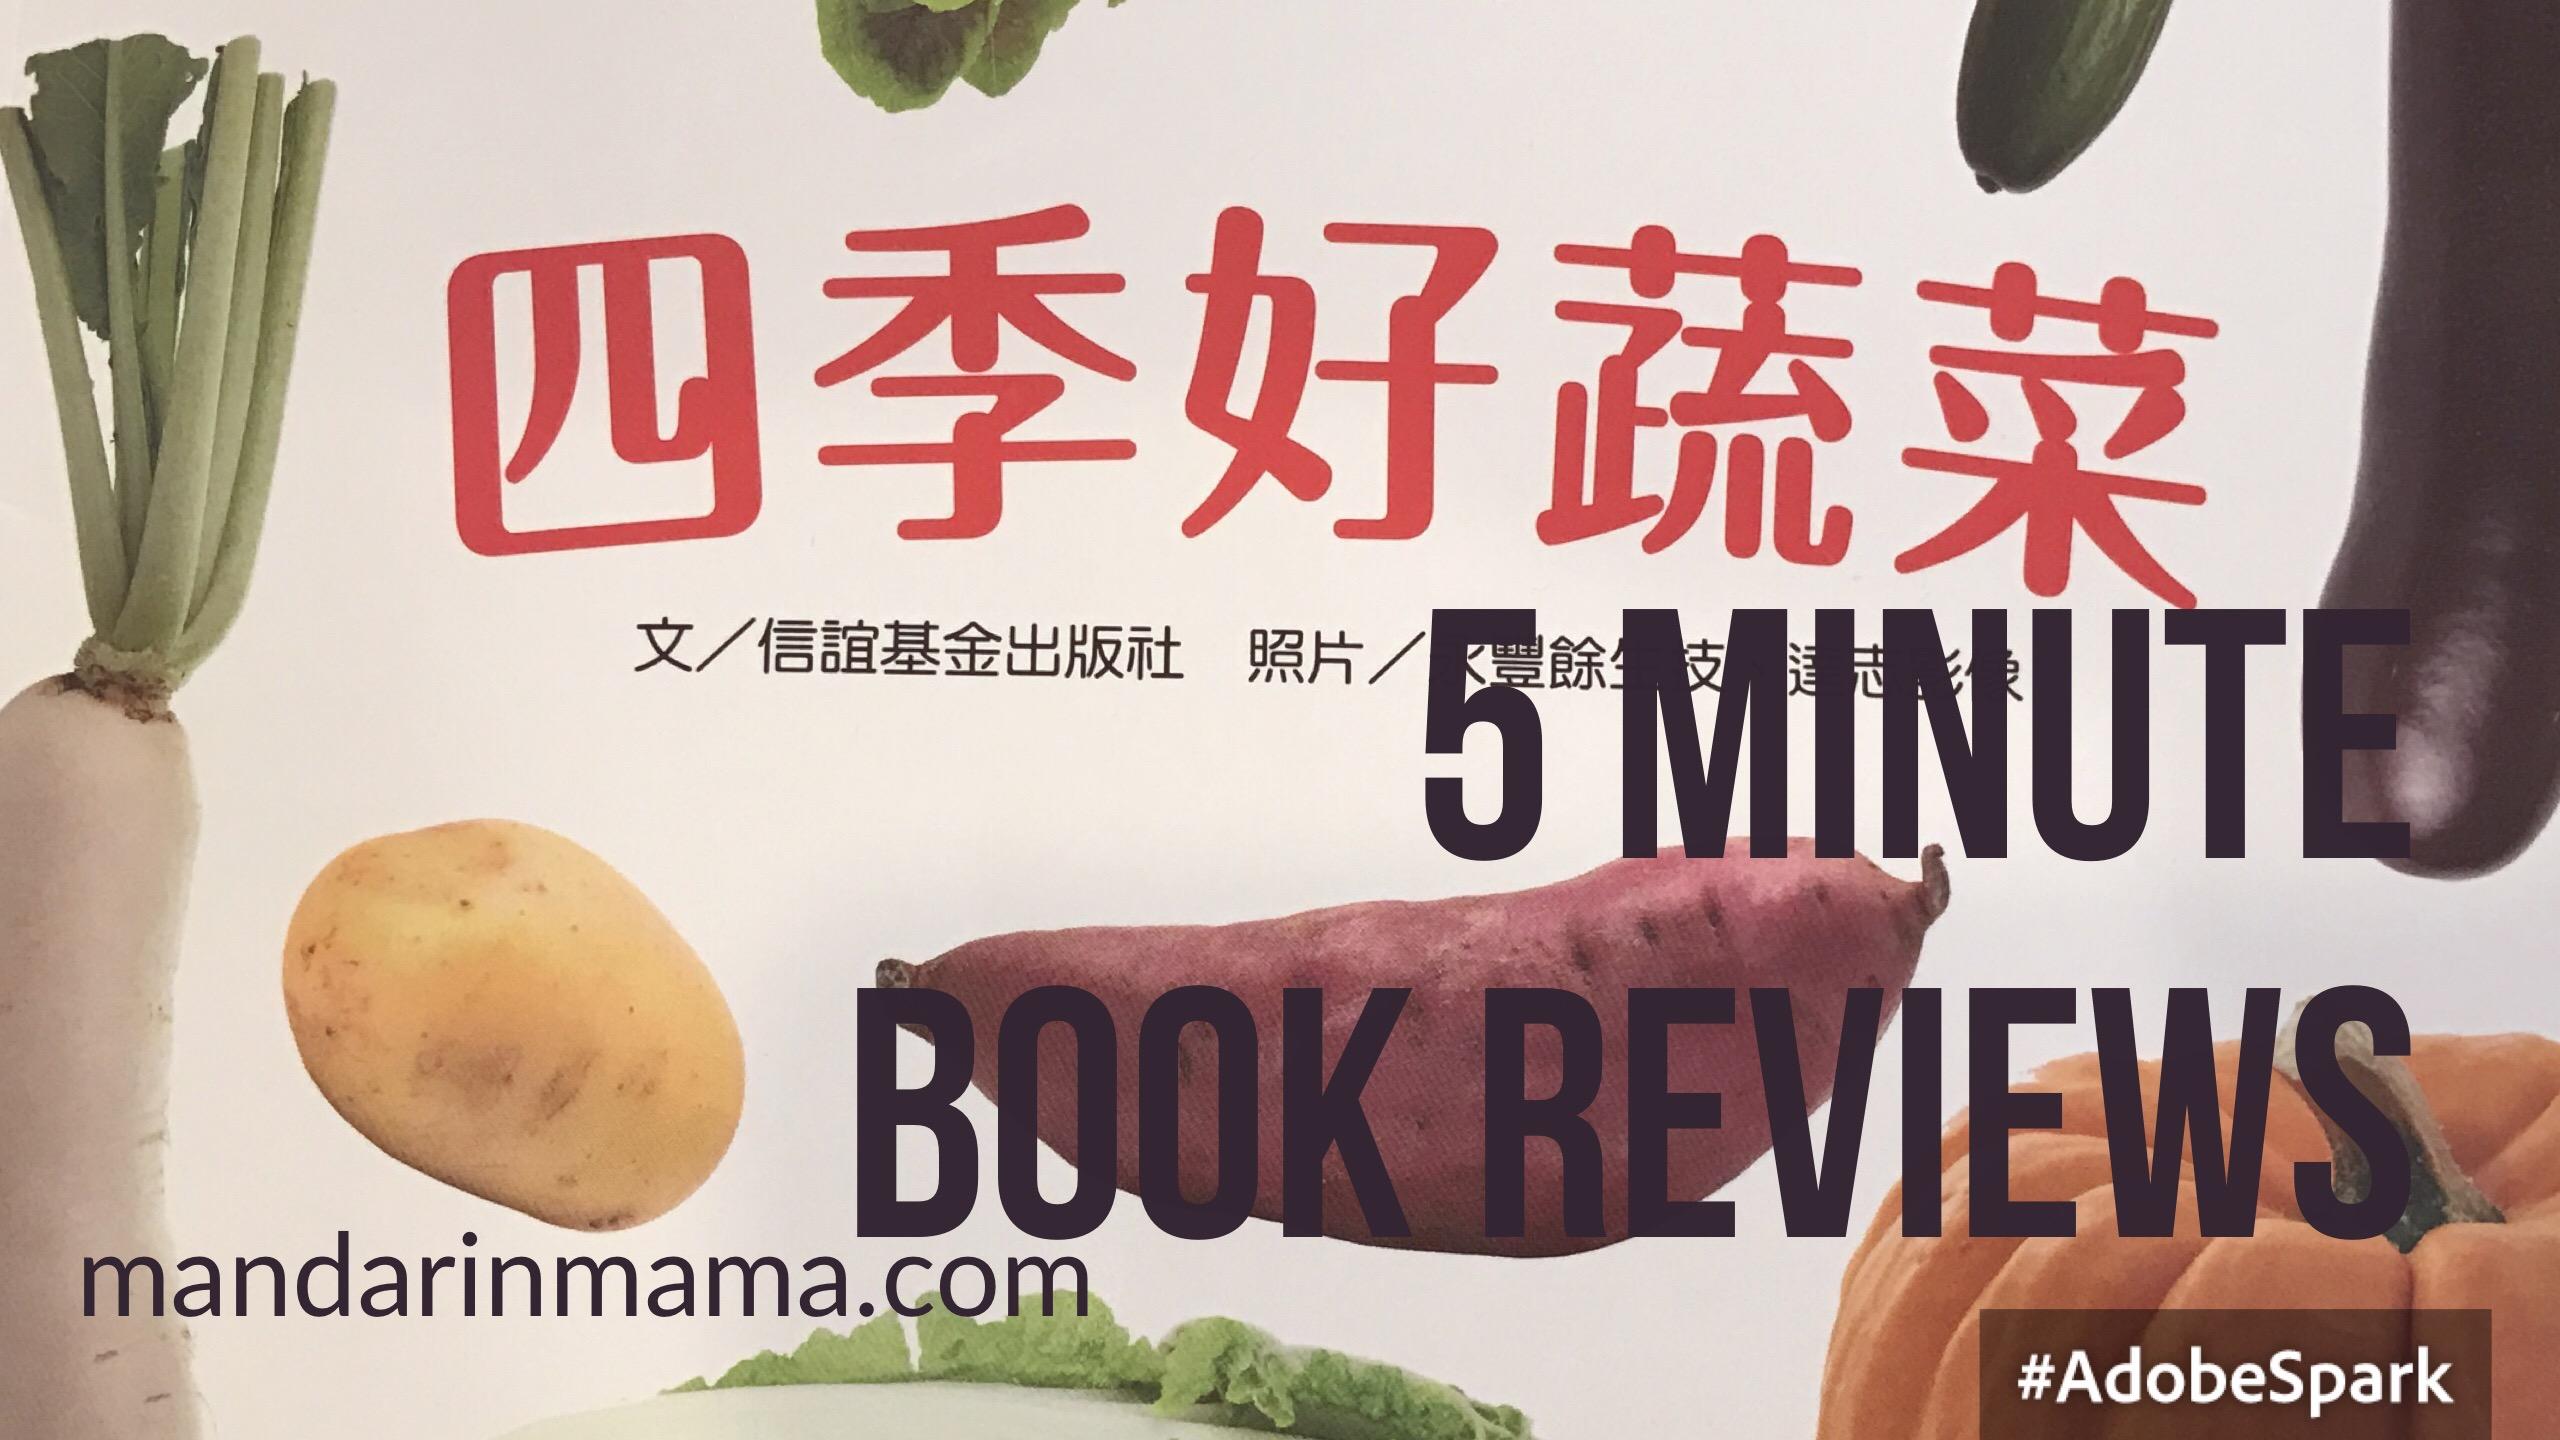 四季好蔬菜: Book Review